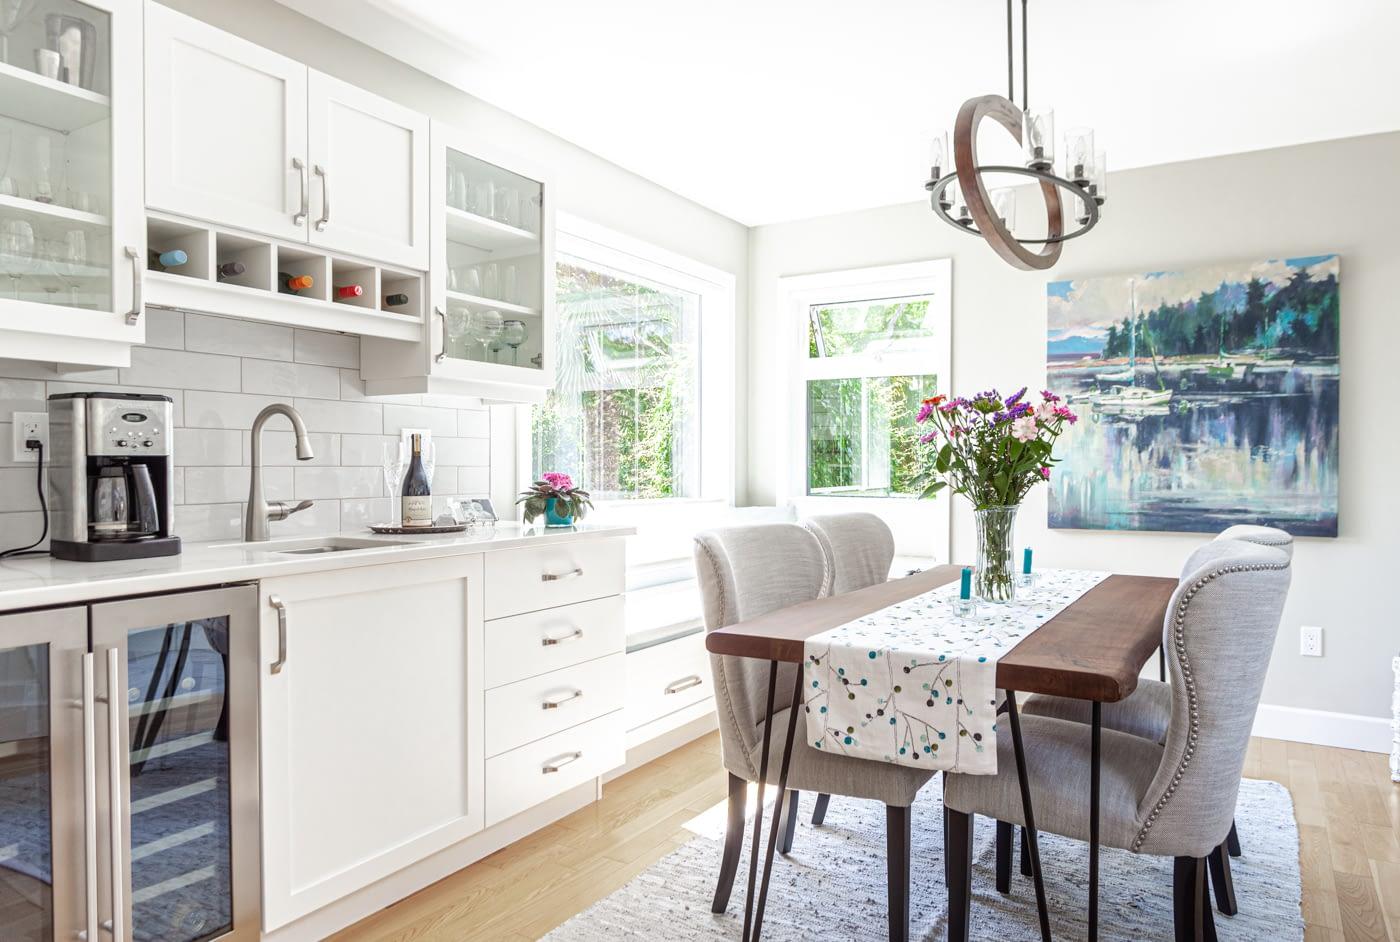 Professional Kitchen and Bathroom Designer – Power Pillar Builders